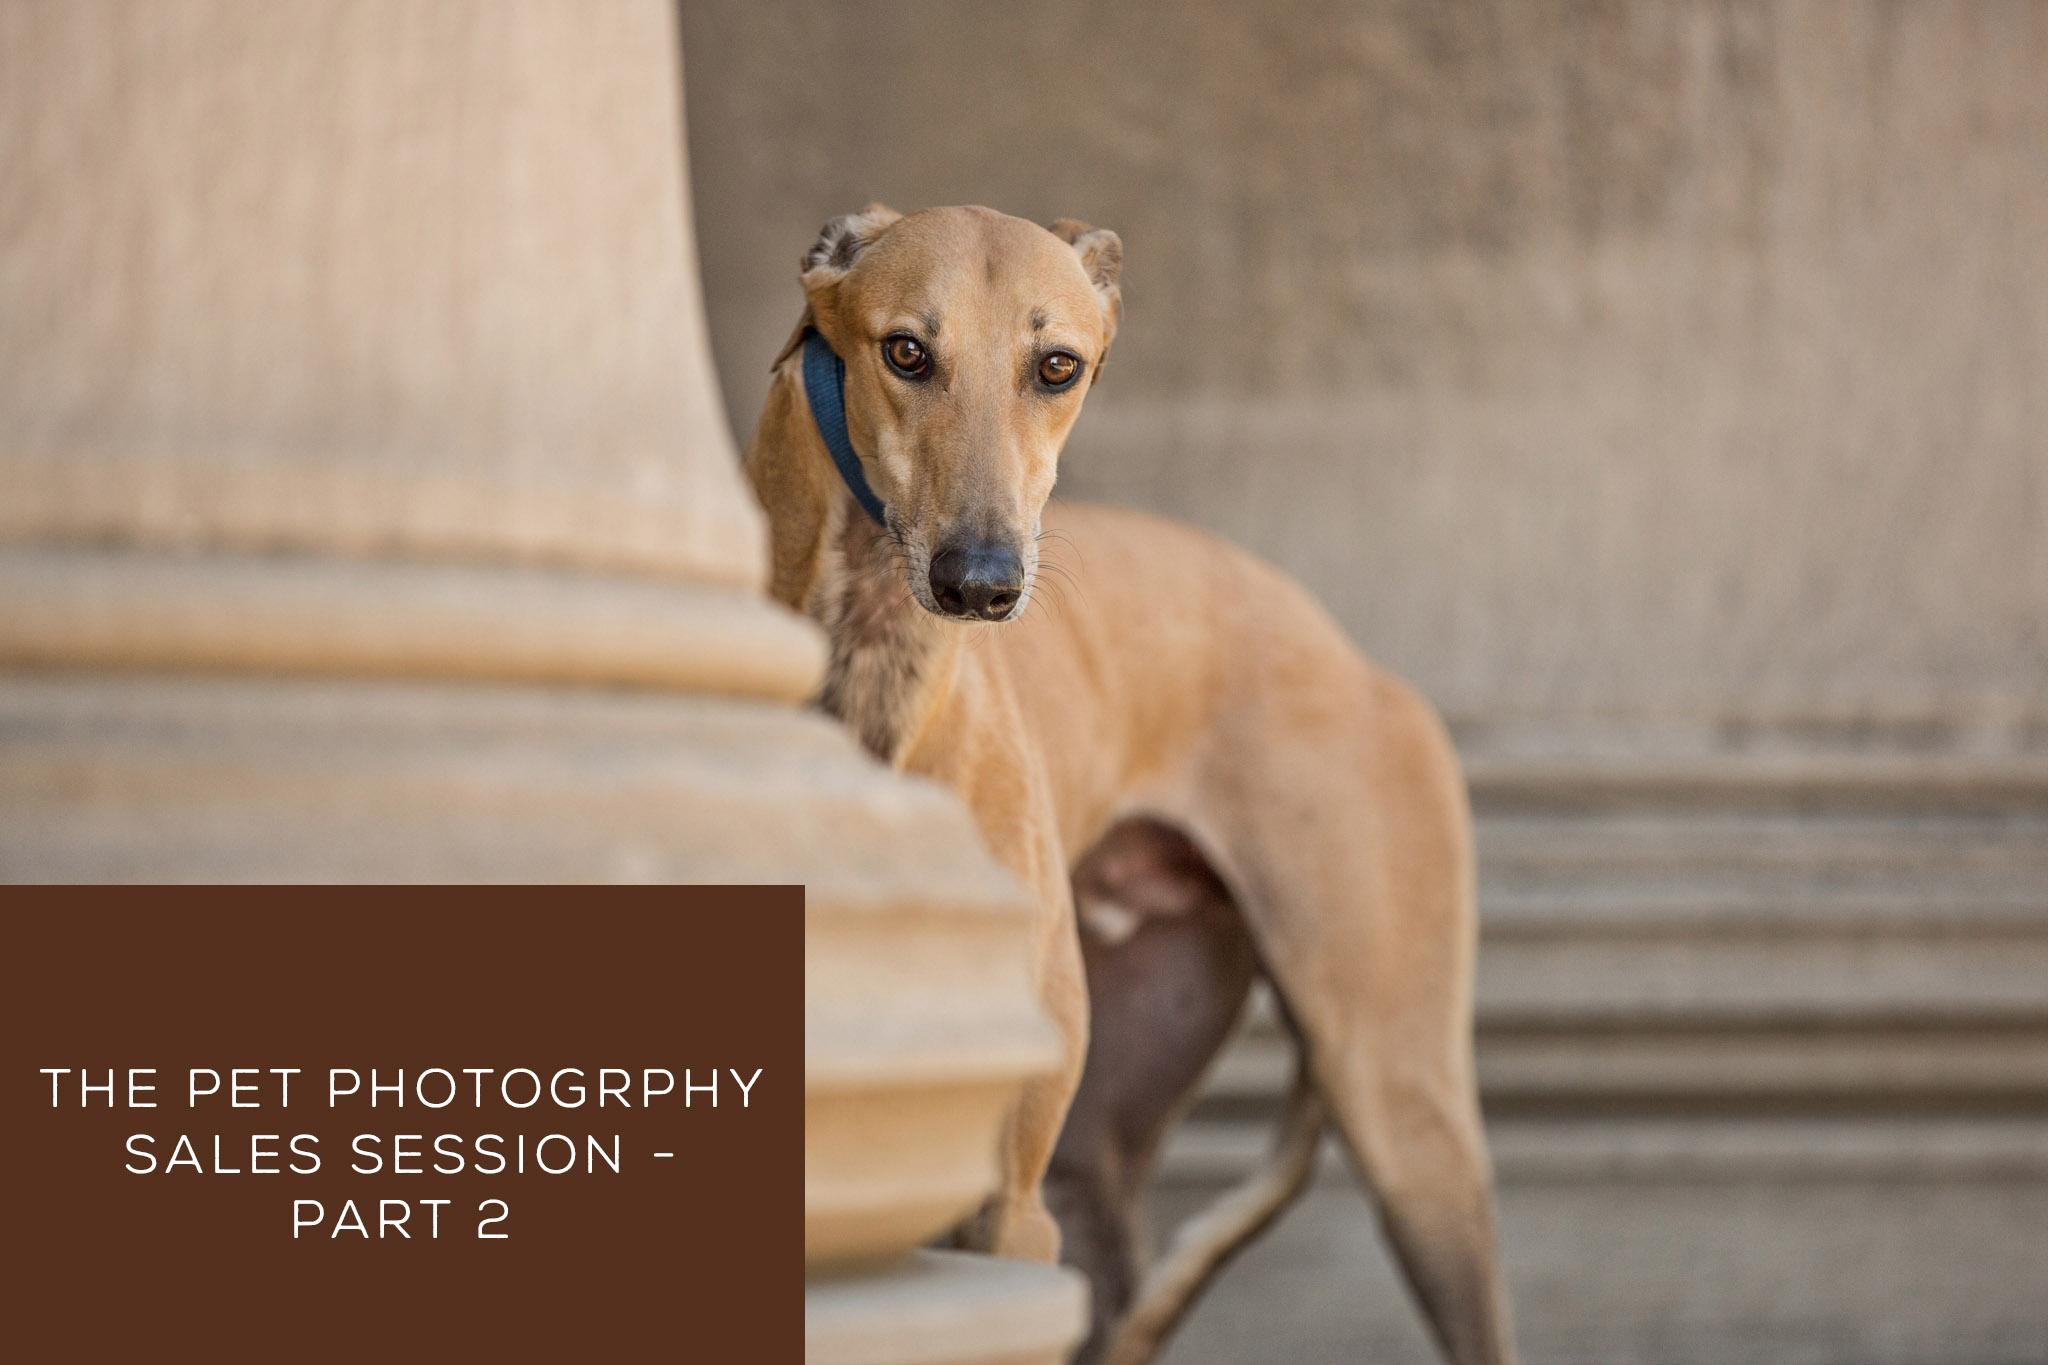 The Pet Photography Sales Session – Part 2